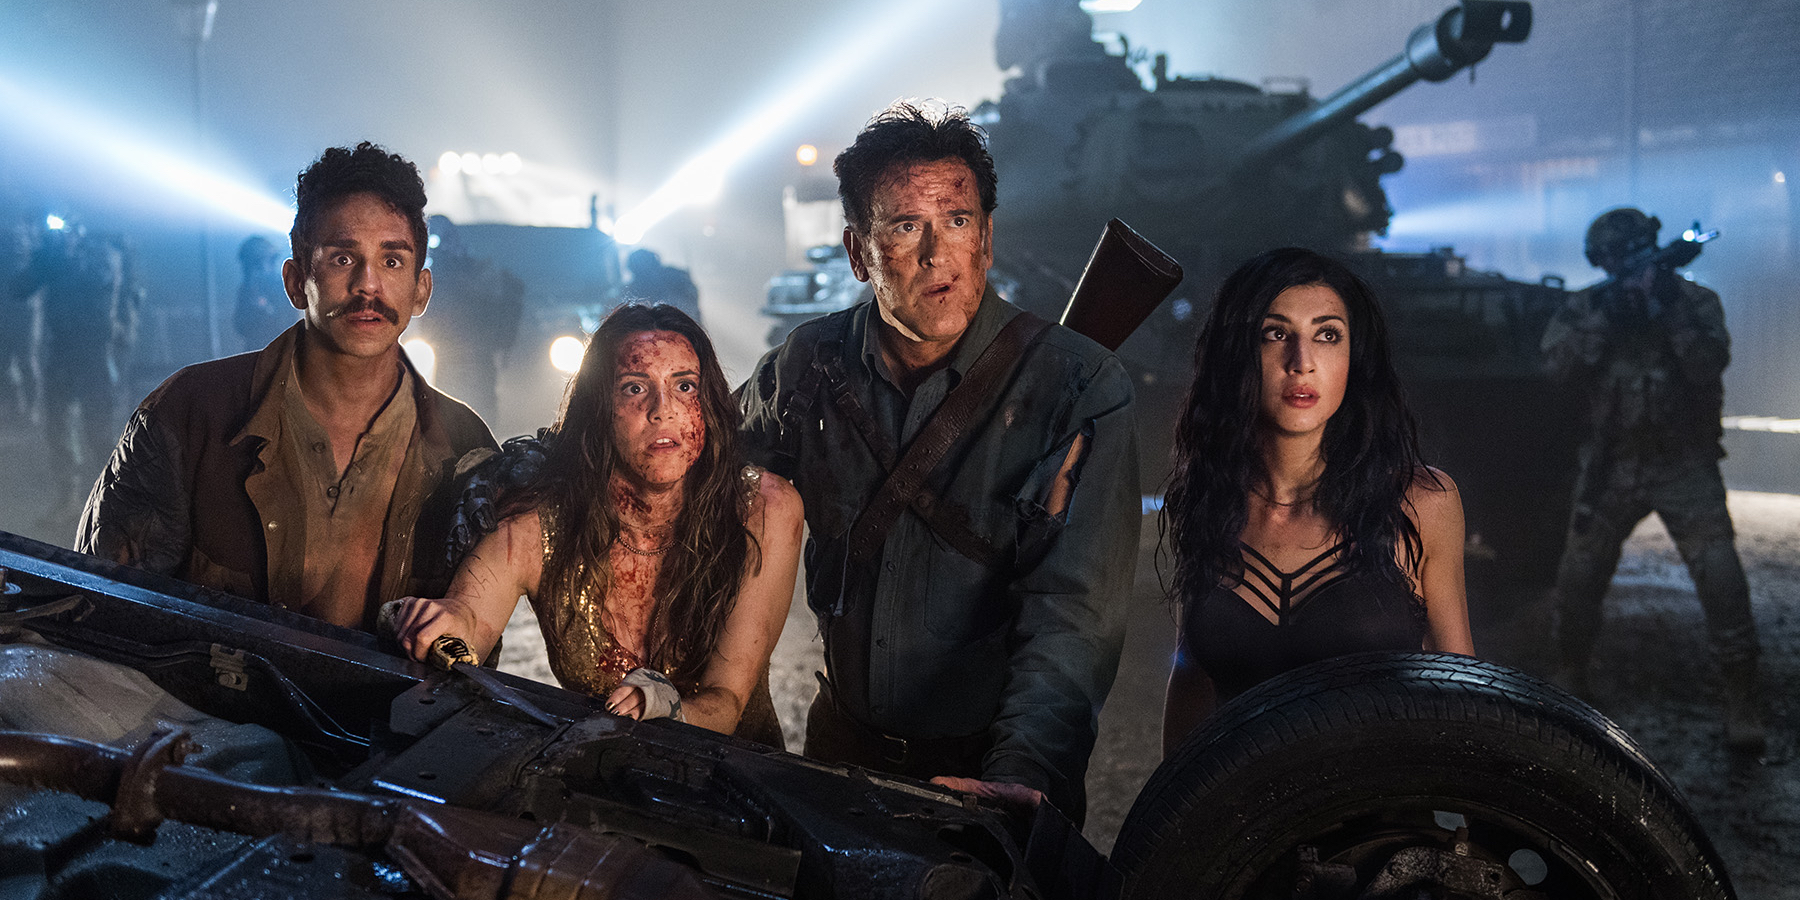 Ray Santiago Bruce Campbell and Dana DeLorenzo in Ash vs. Evil Dead